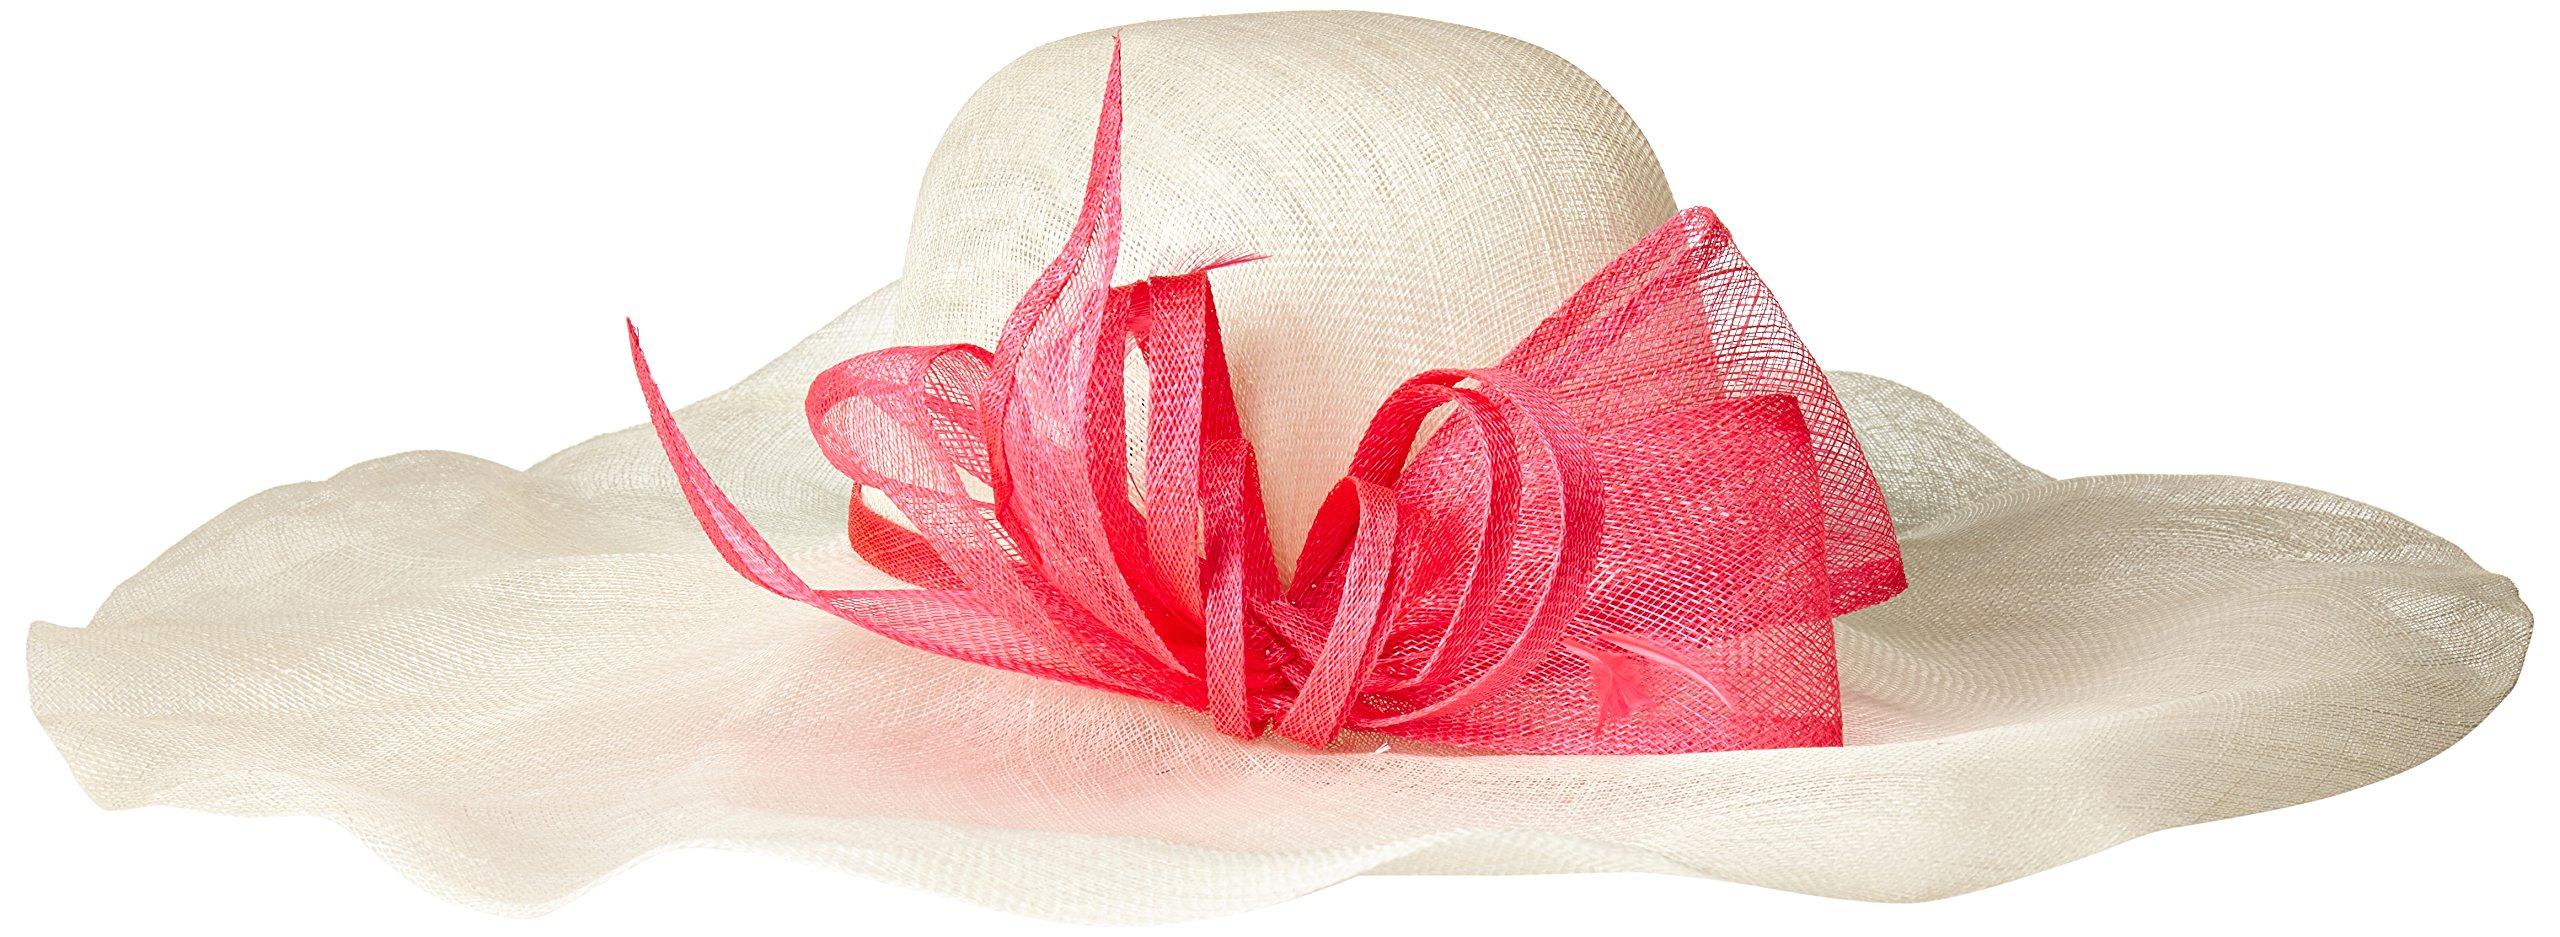 Scala Women's Soft Brim Sinamay Hat with Bow, Ivory/Fuchsia, One Size by Scala